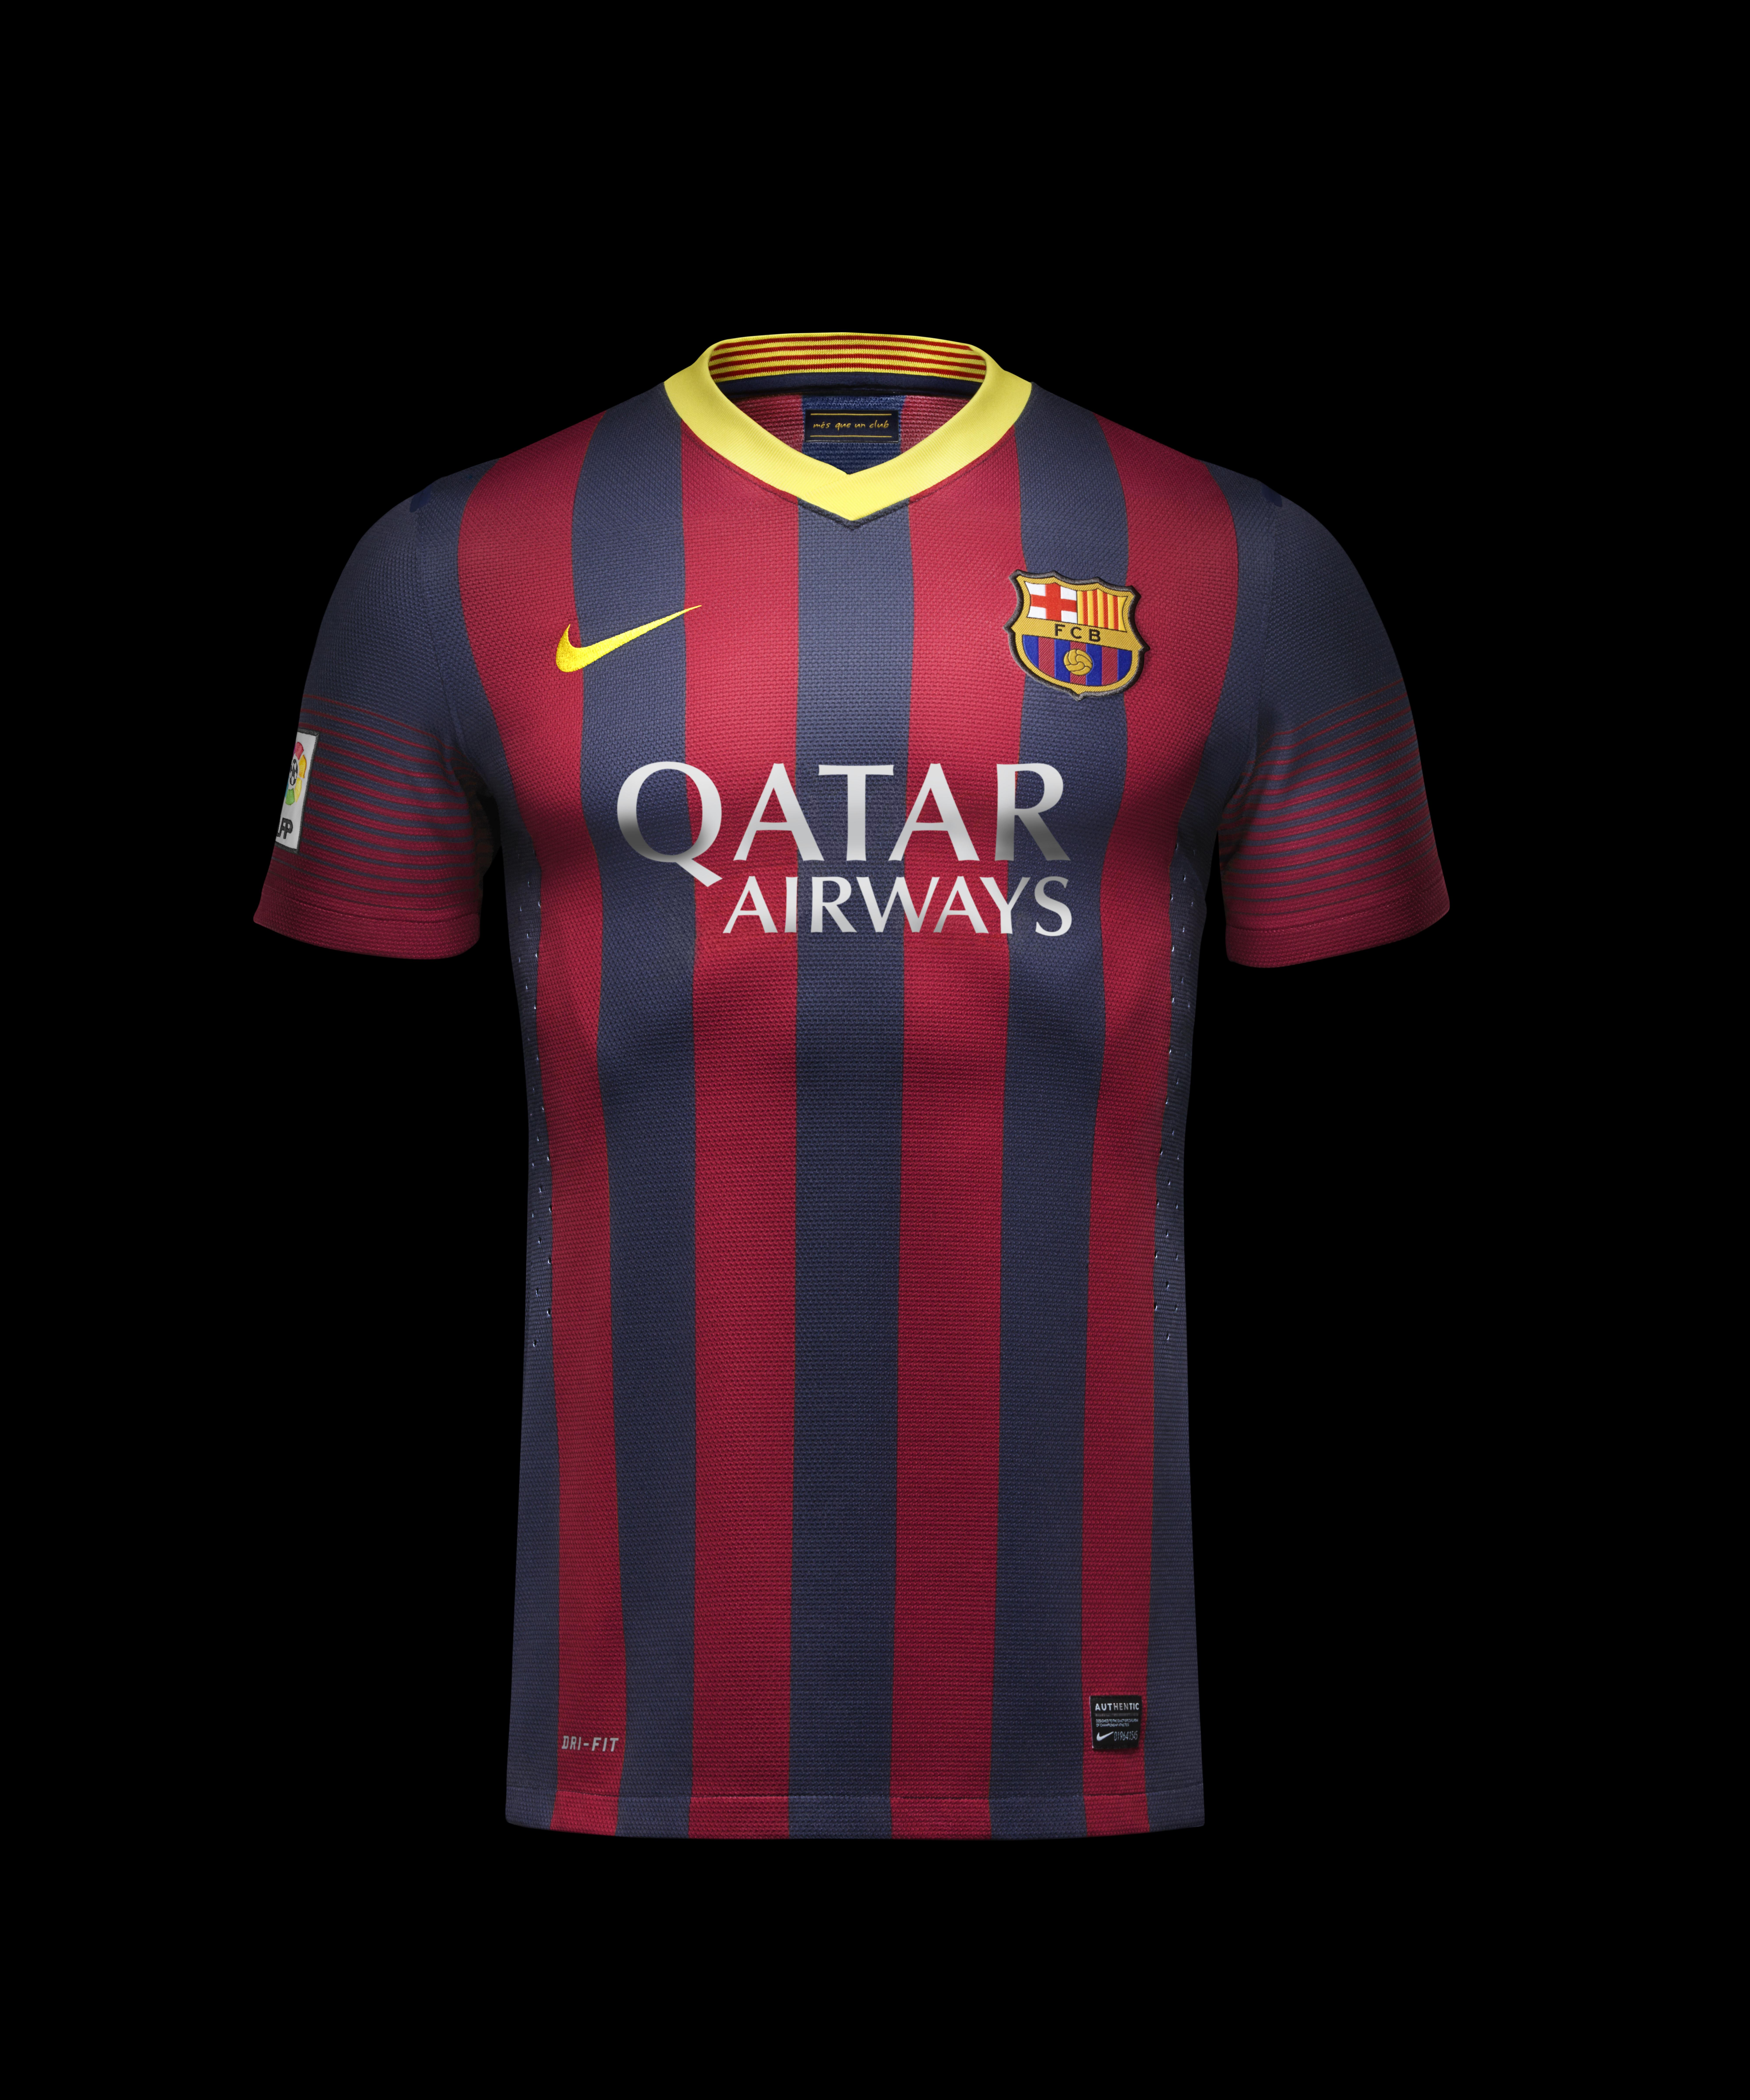 Image Result For Futbol Club Barcelona Nike